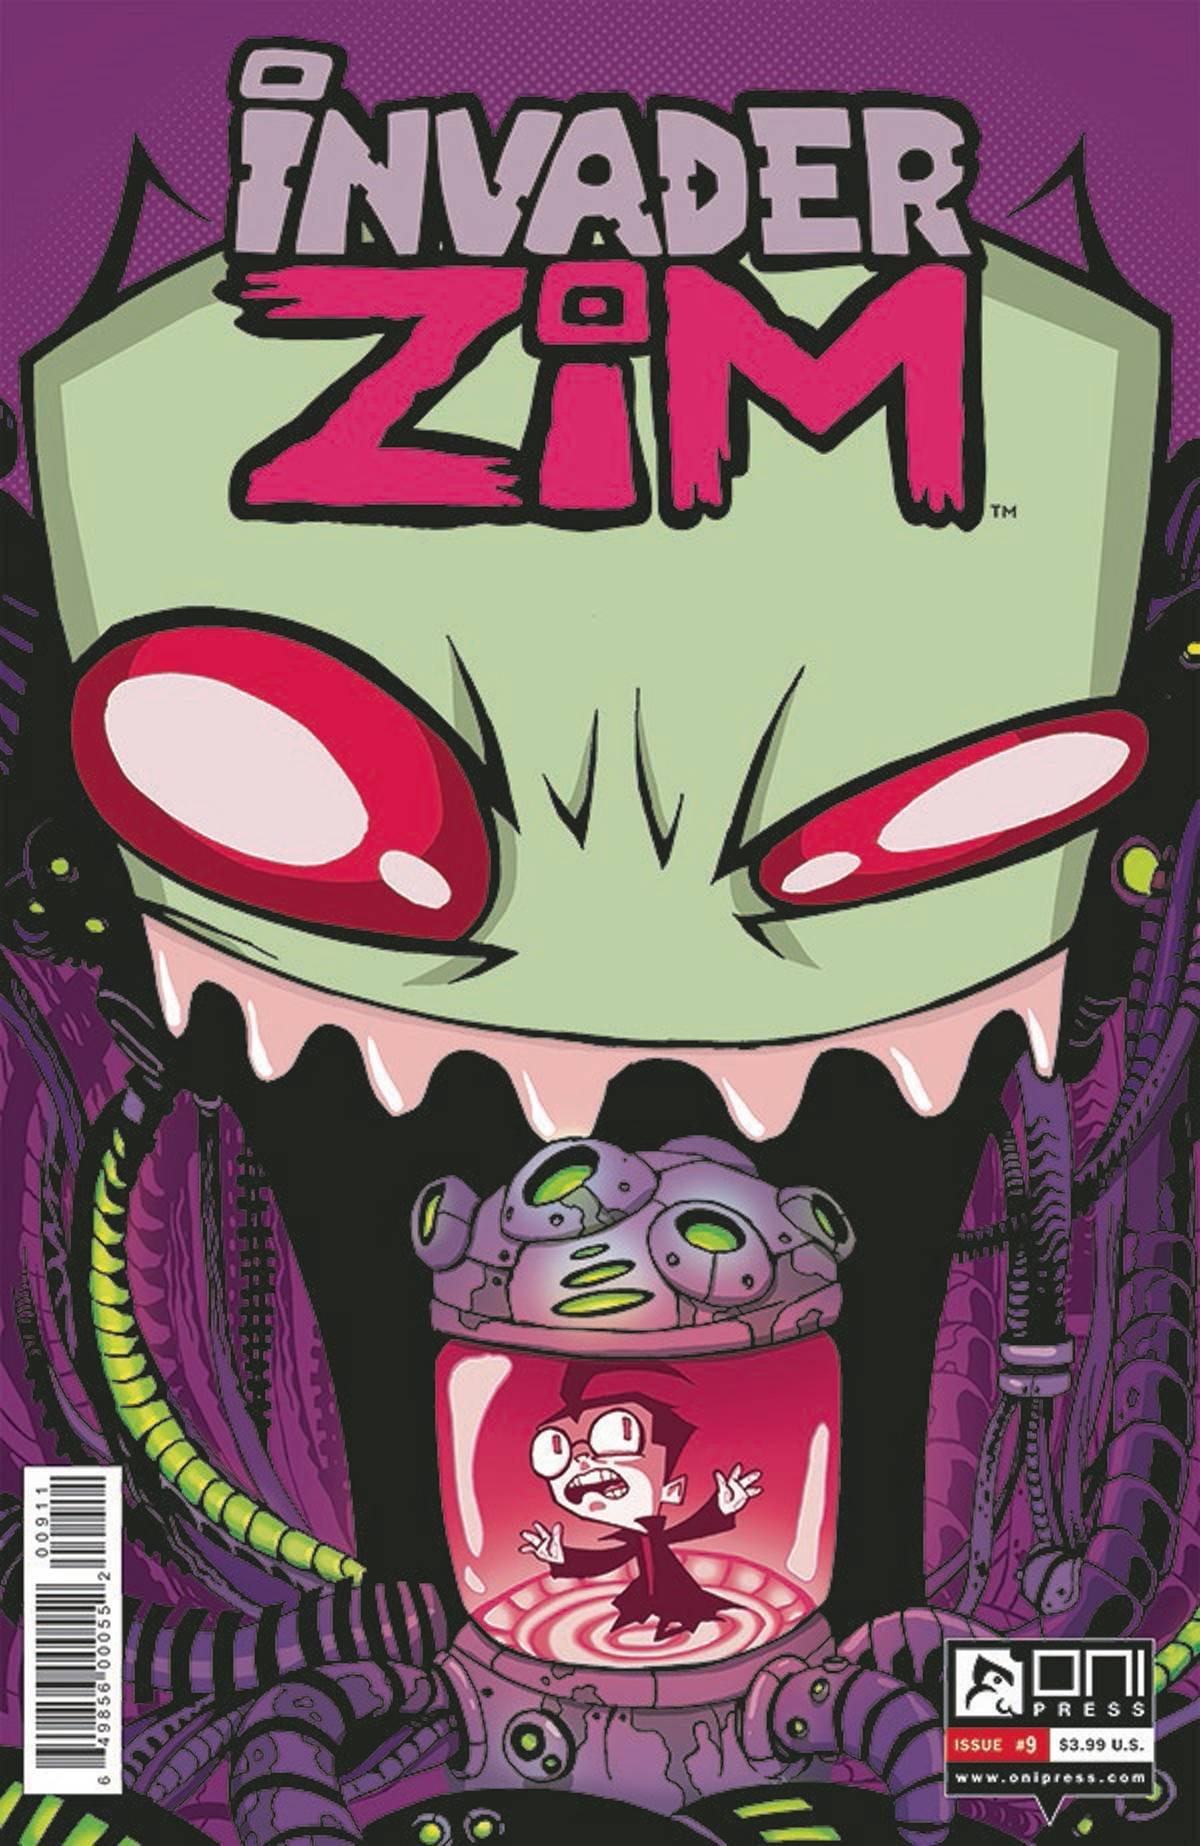 Read Online INVADER ZIM #9 Cover A pdf epub